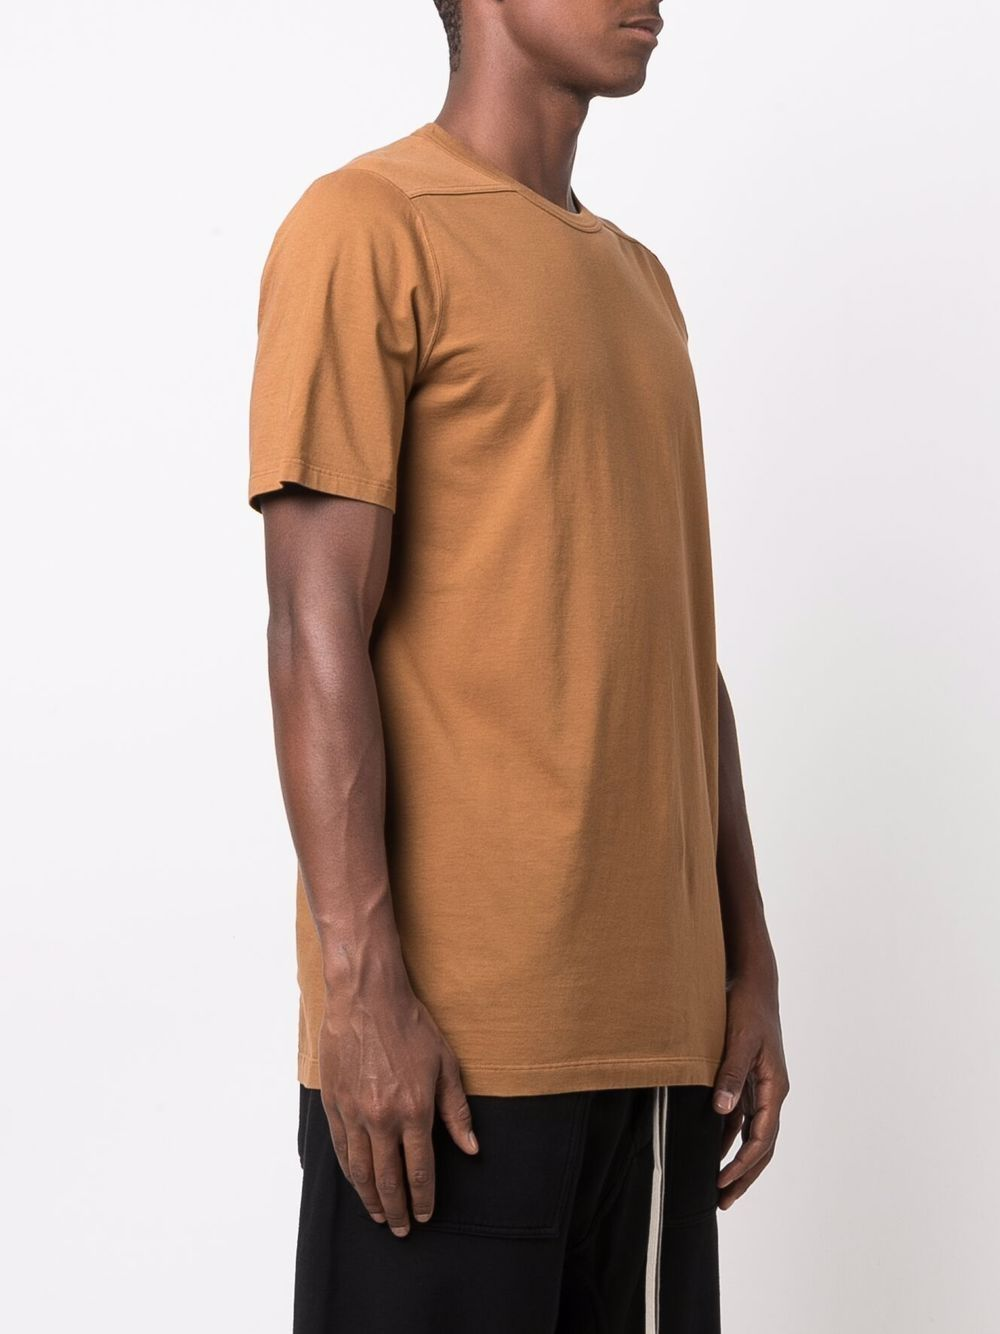 t-shirt level t uomo beige in cotone RICK OWENS | T-shirt | RU02A5264 JA24